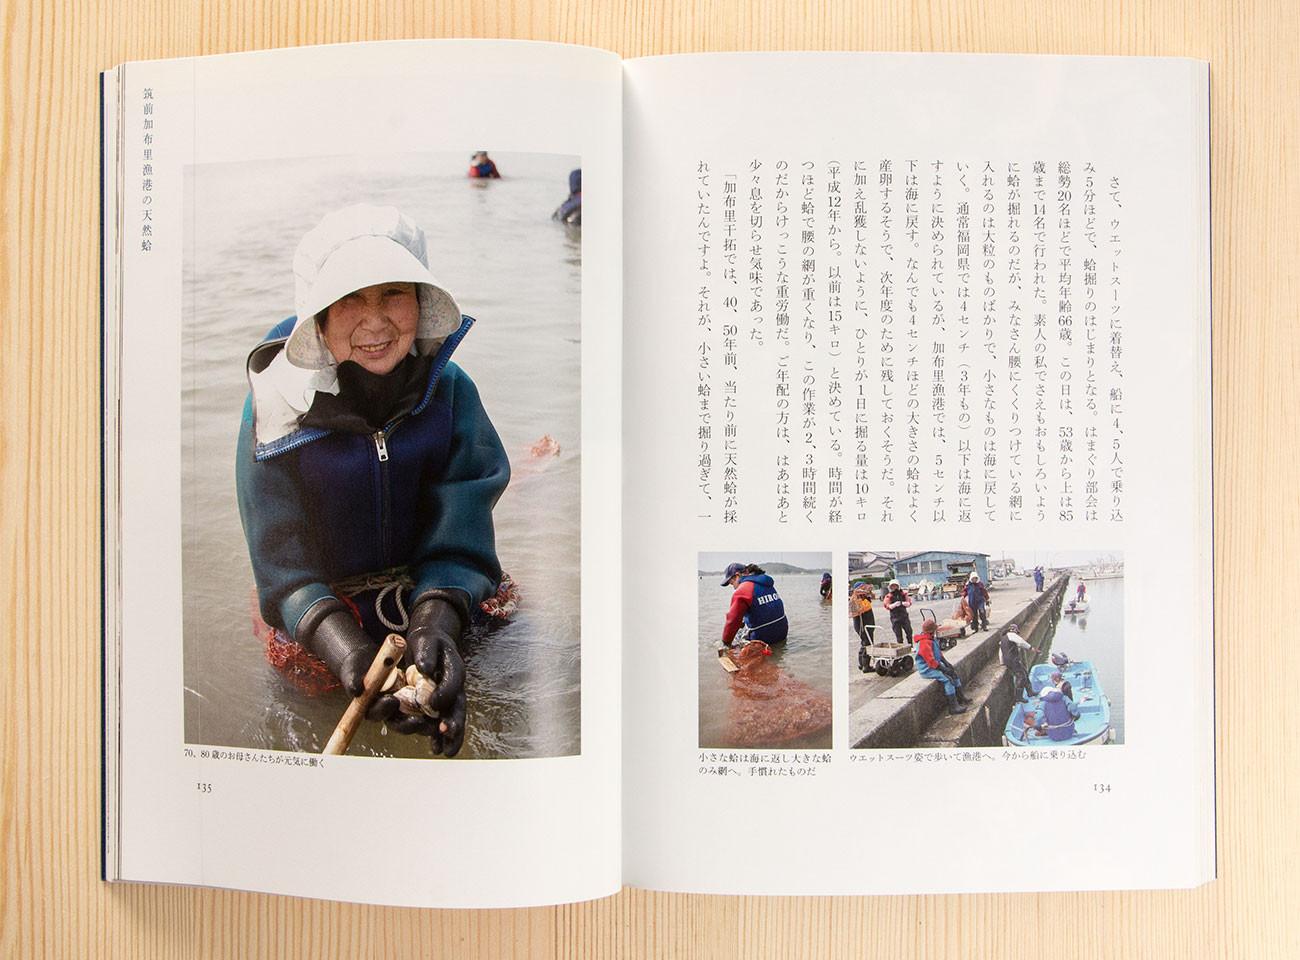 2011_Itoshima_IMG_1741.jpg